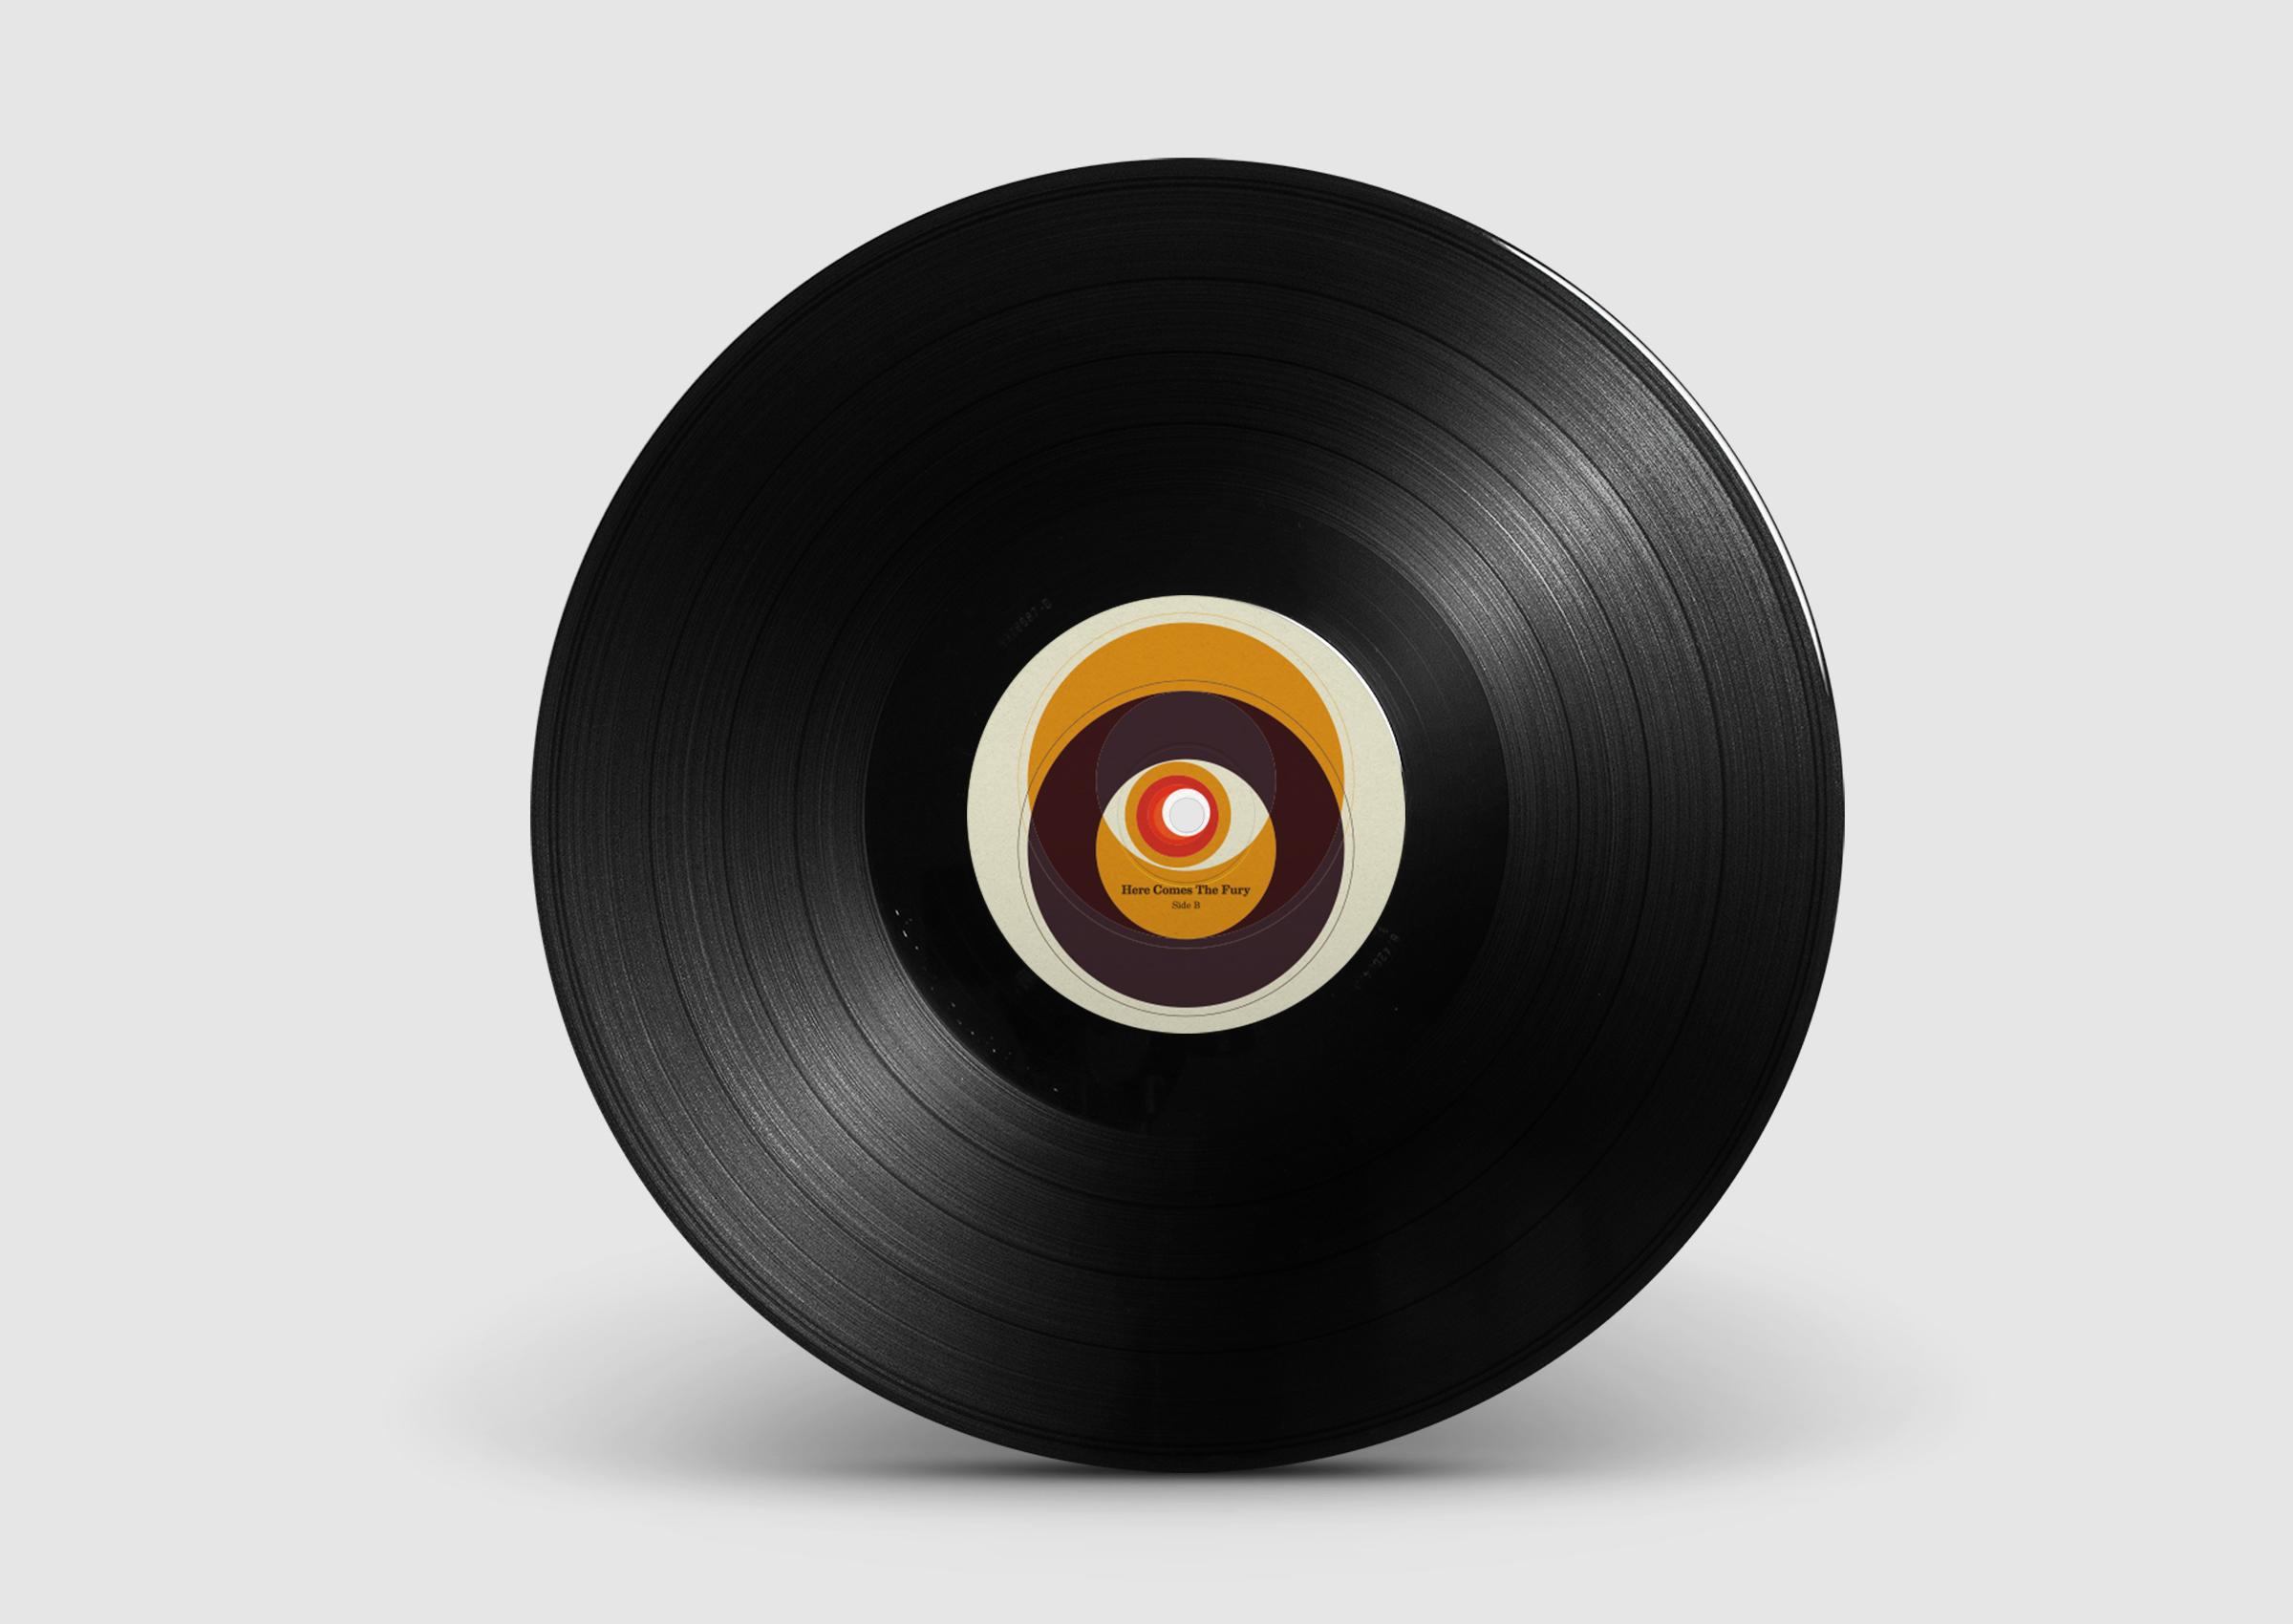 Richie-Noonday-Vinyl-Record-Label.jpg